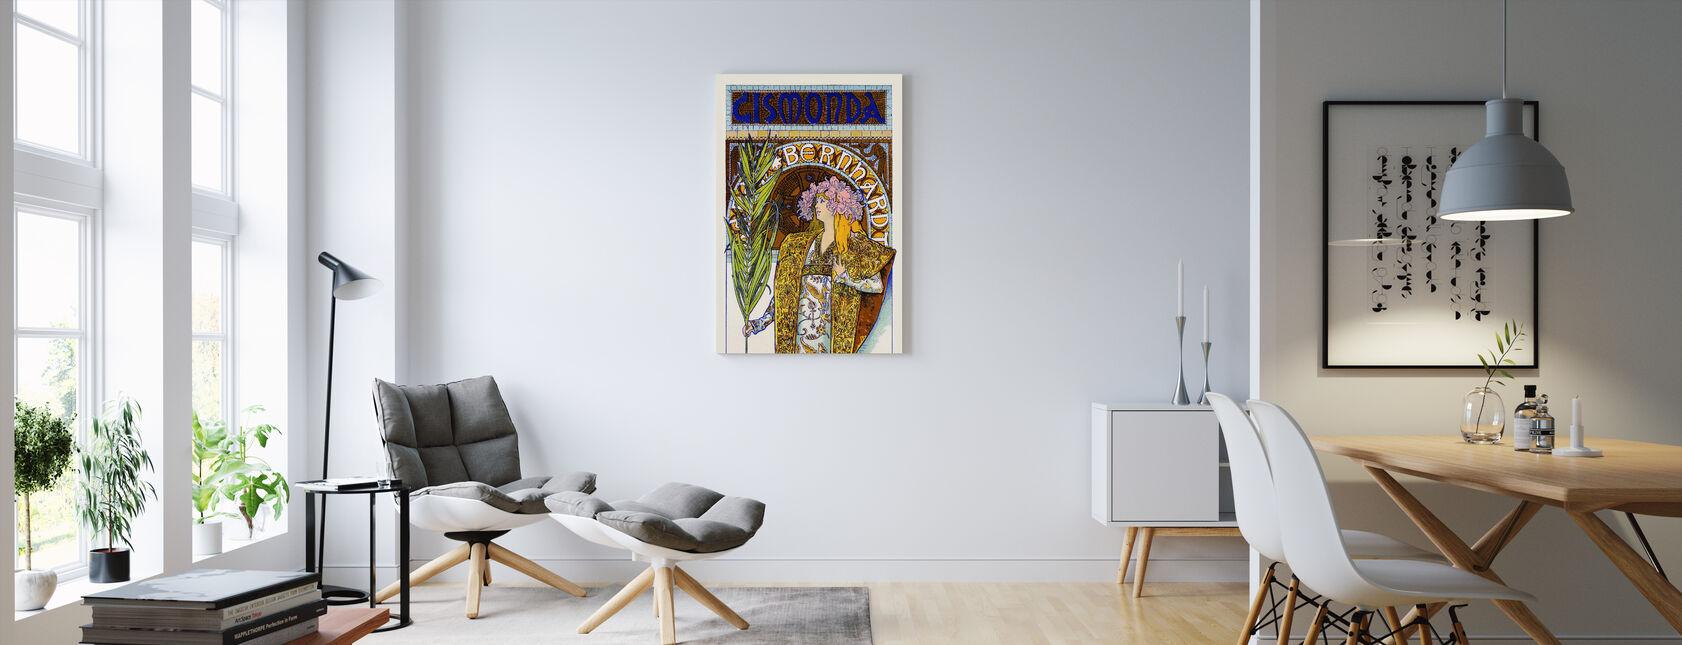 Alphonse Mucha - Theatre Renaissance - Canvas print - Living Room